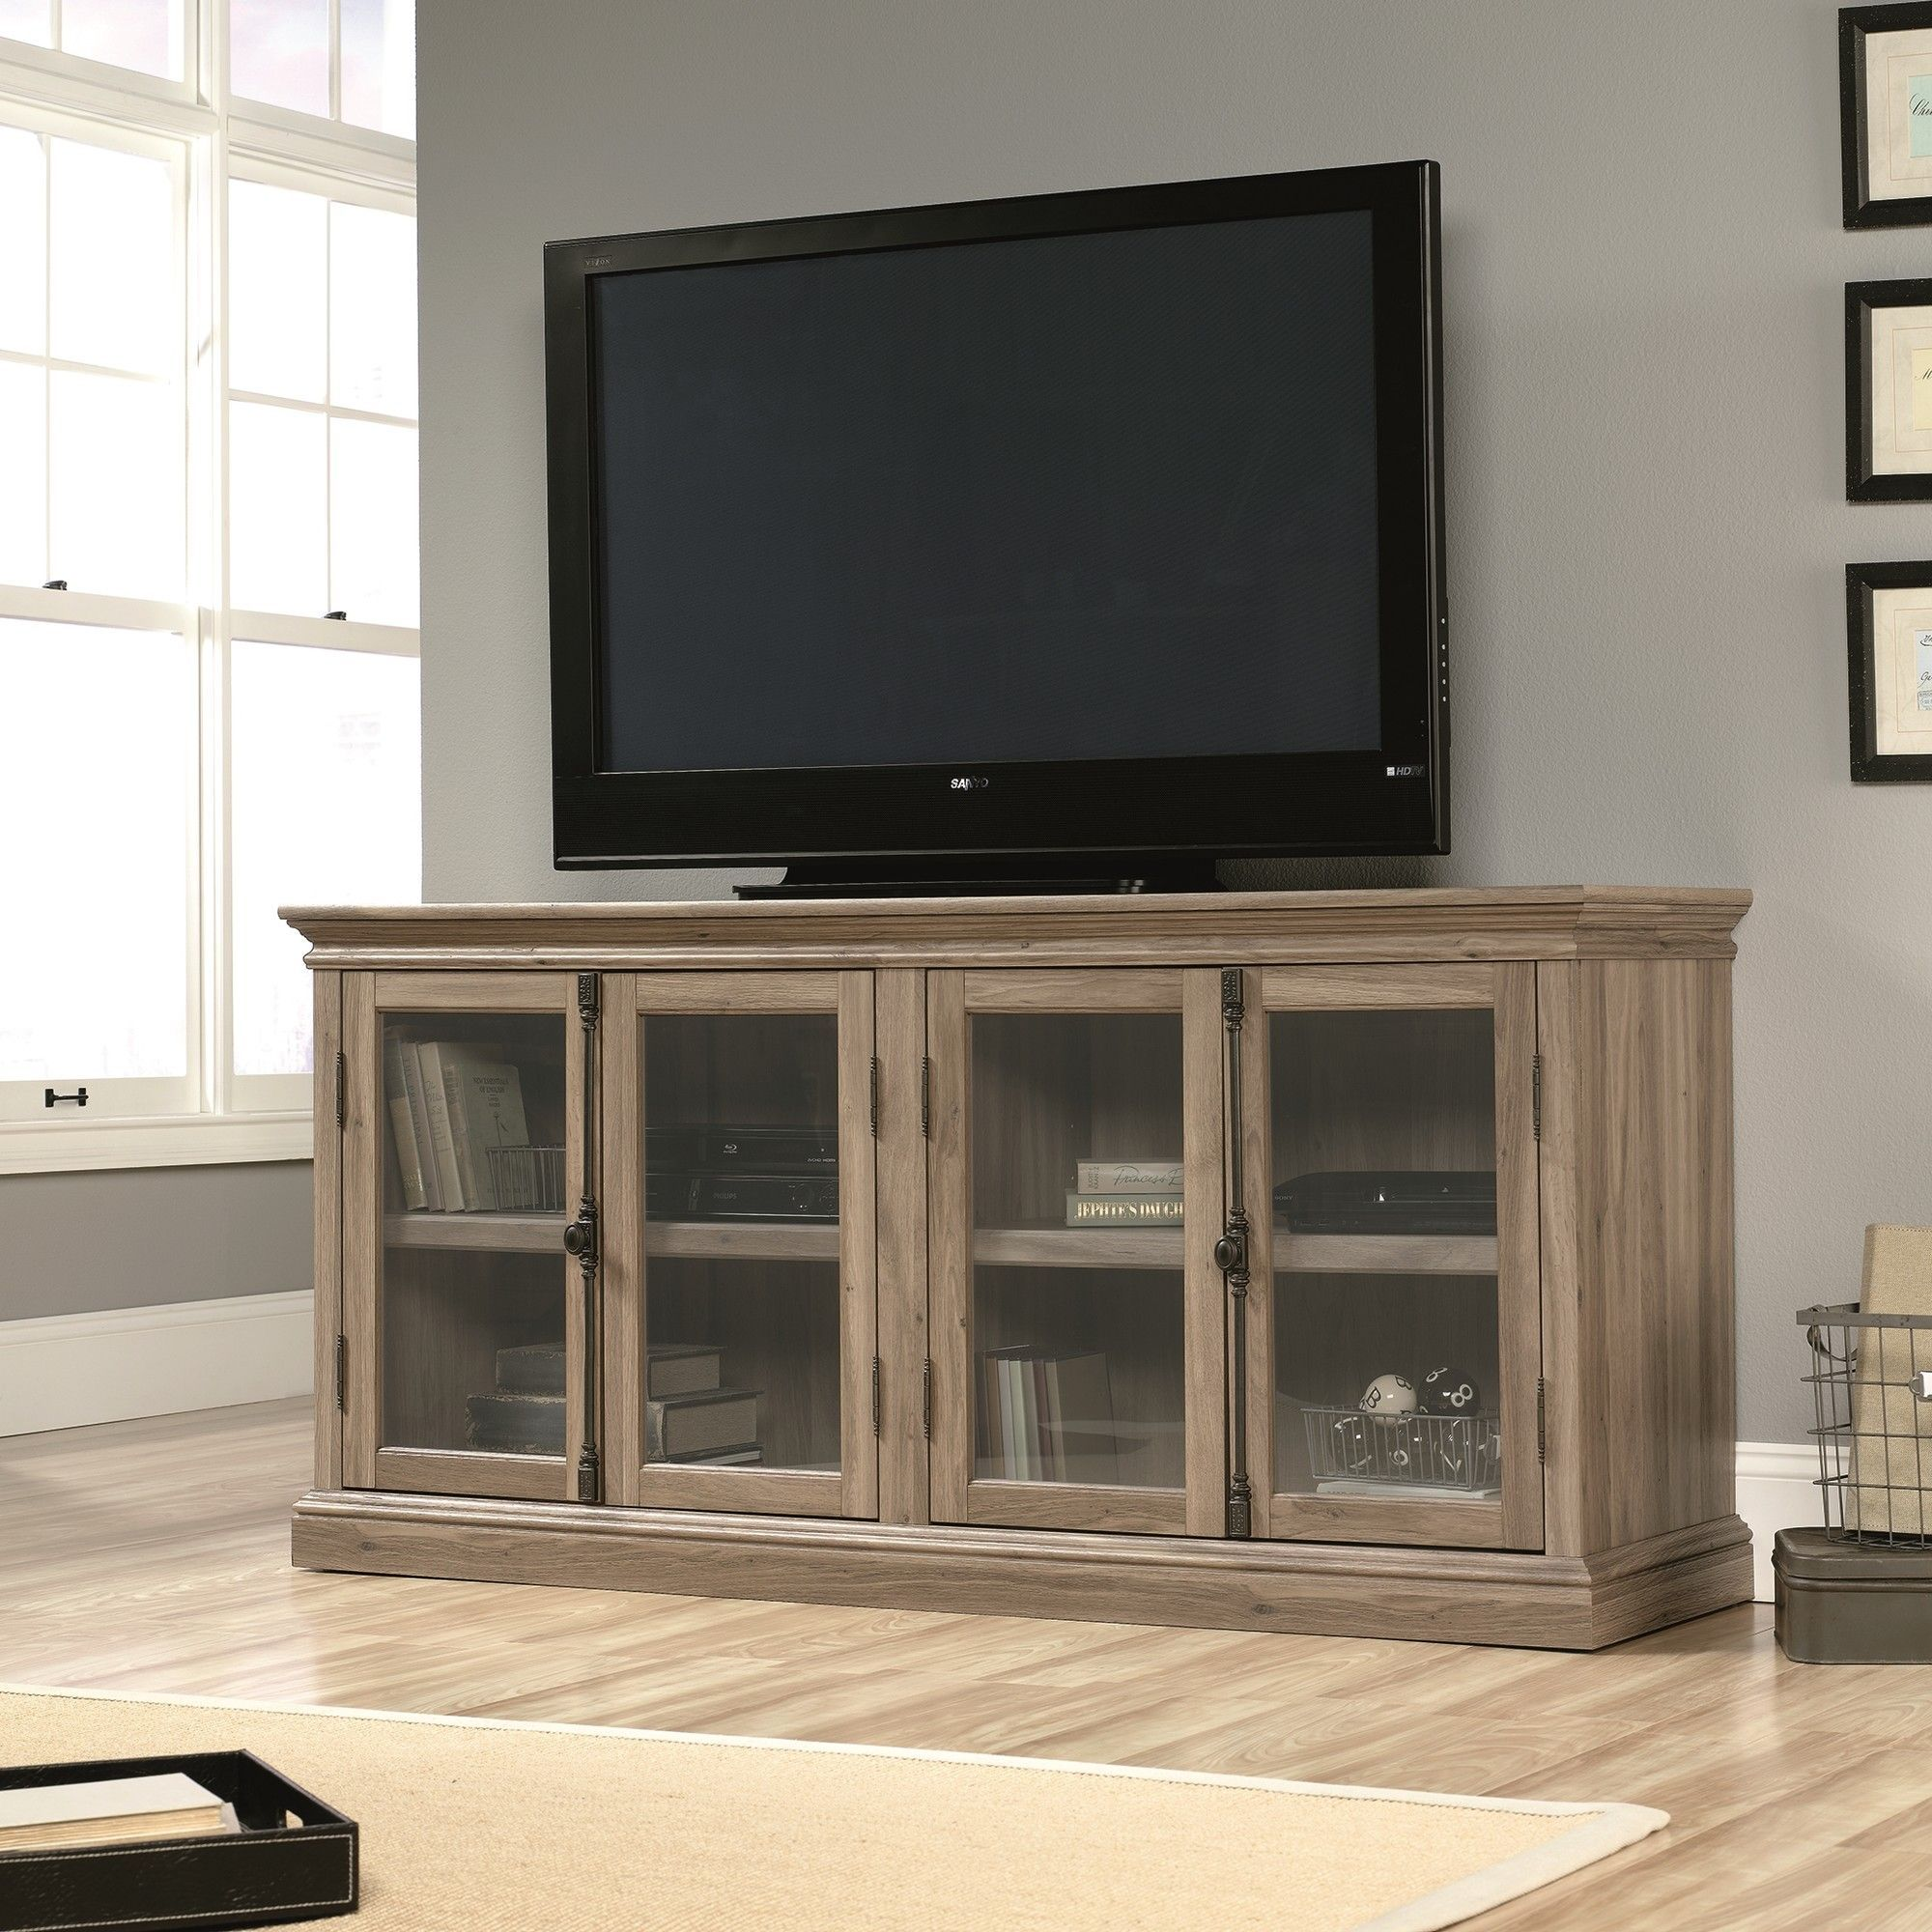 Woodbridge Home Designs Hadley TV Stand